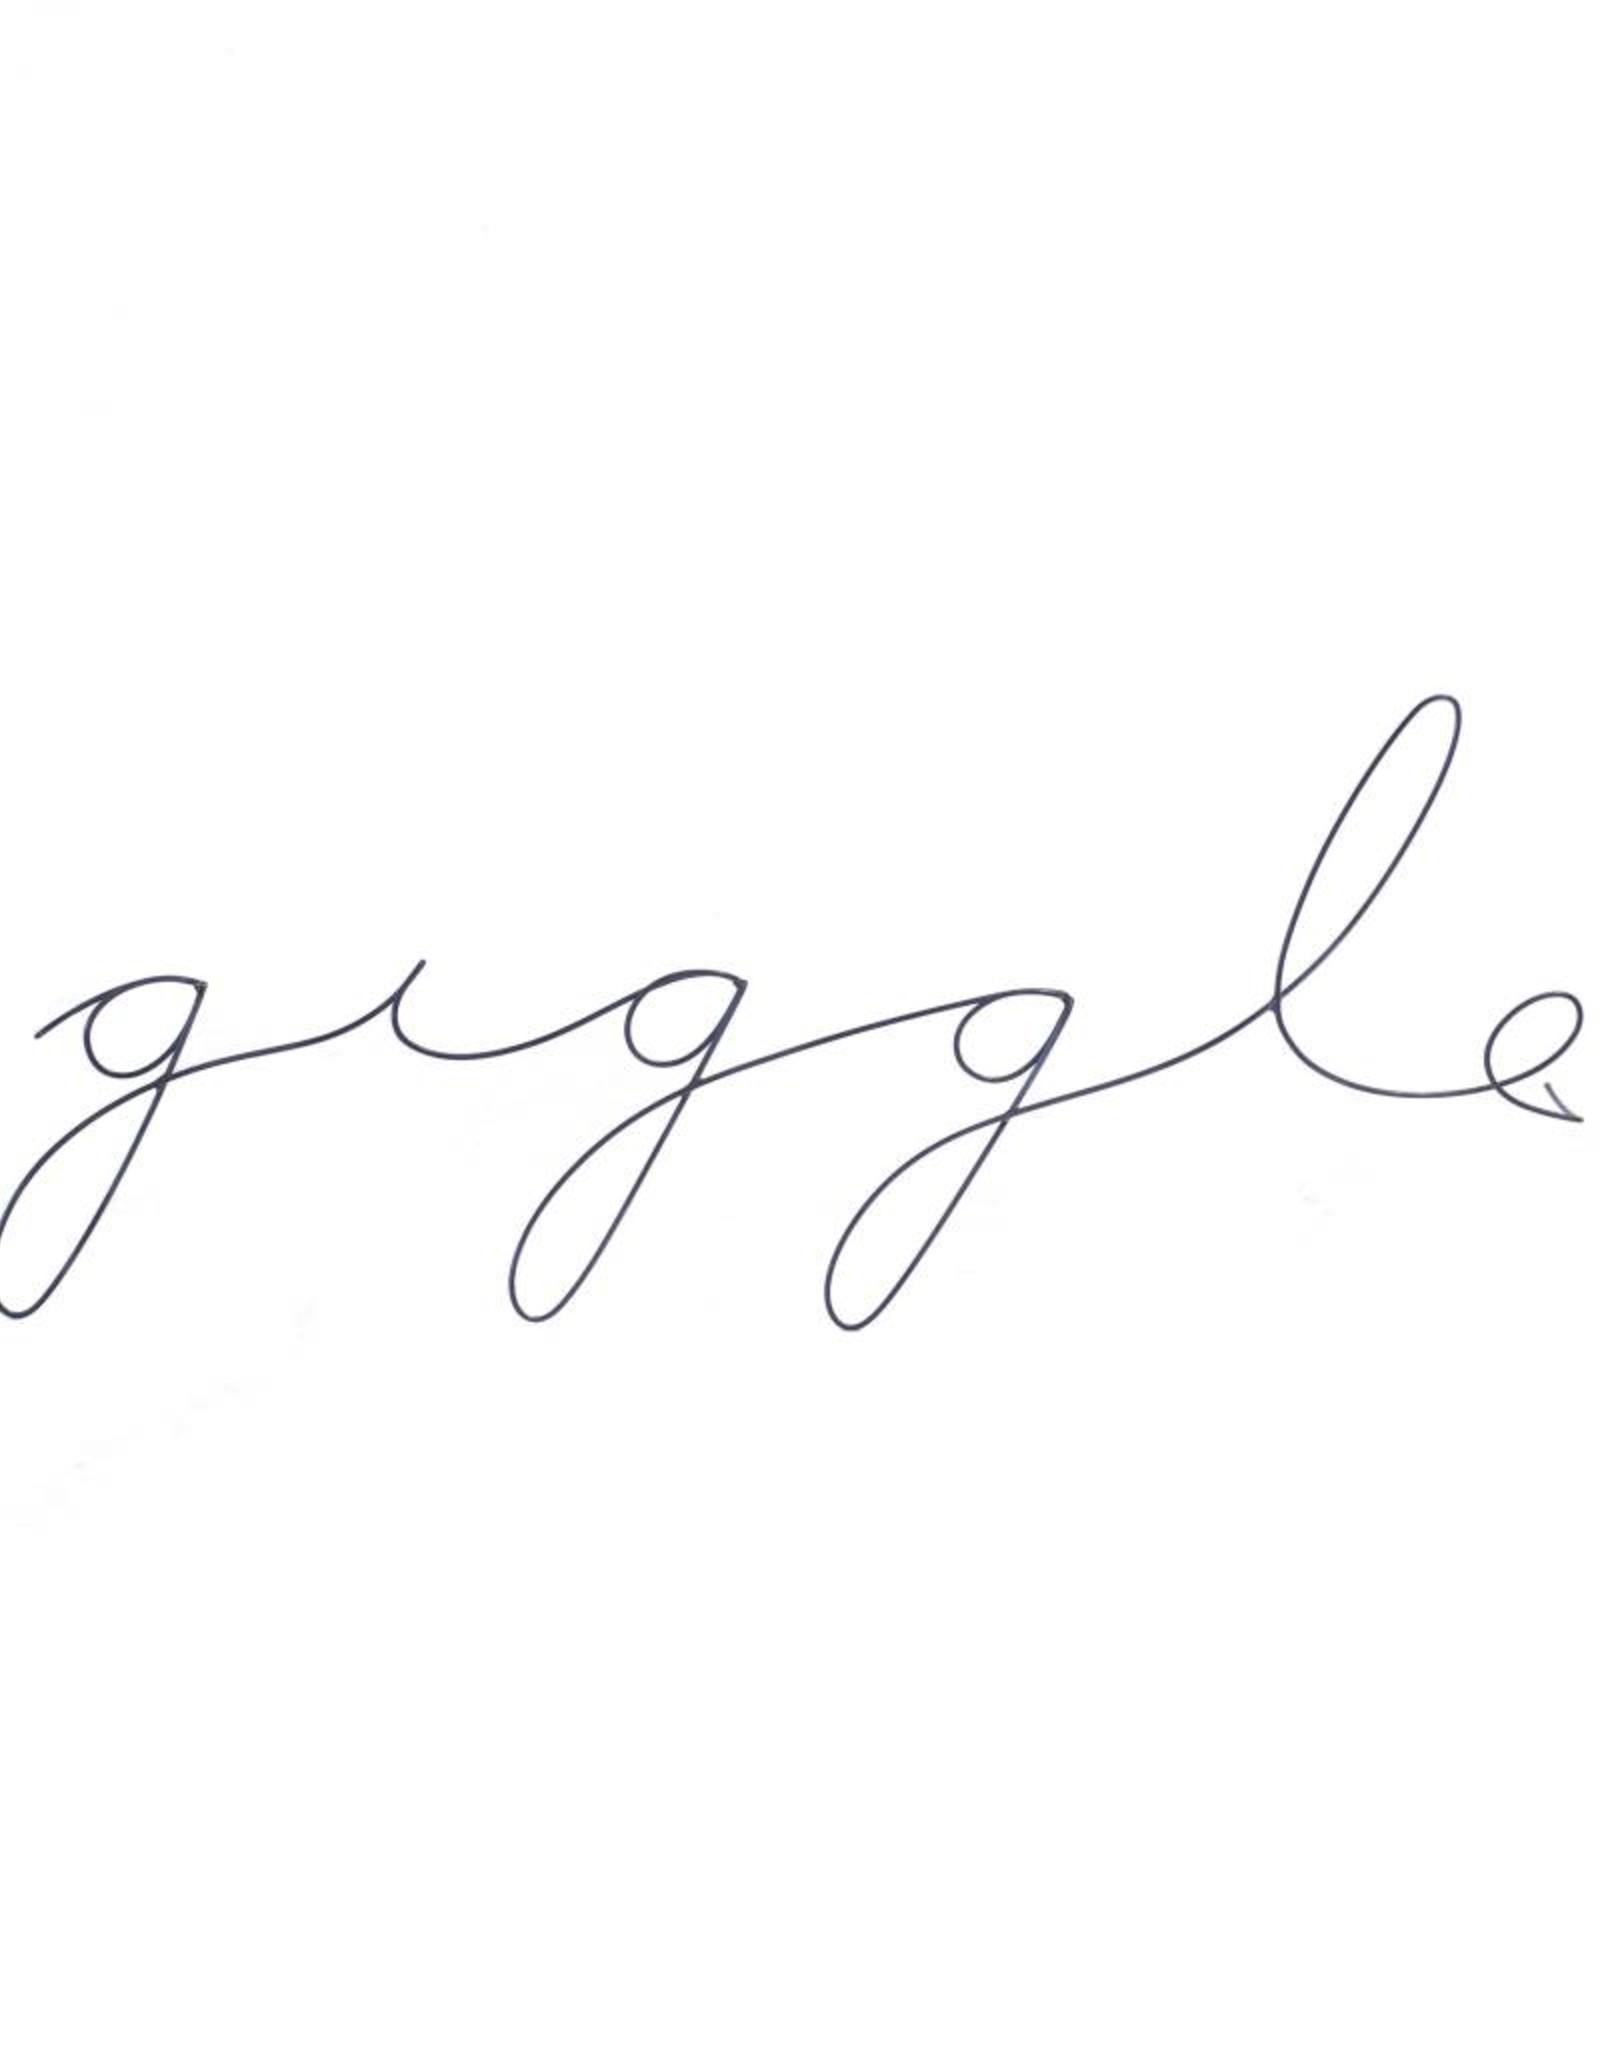 Gauge NYC 'giggle' Wire Word Poetic